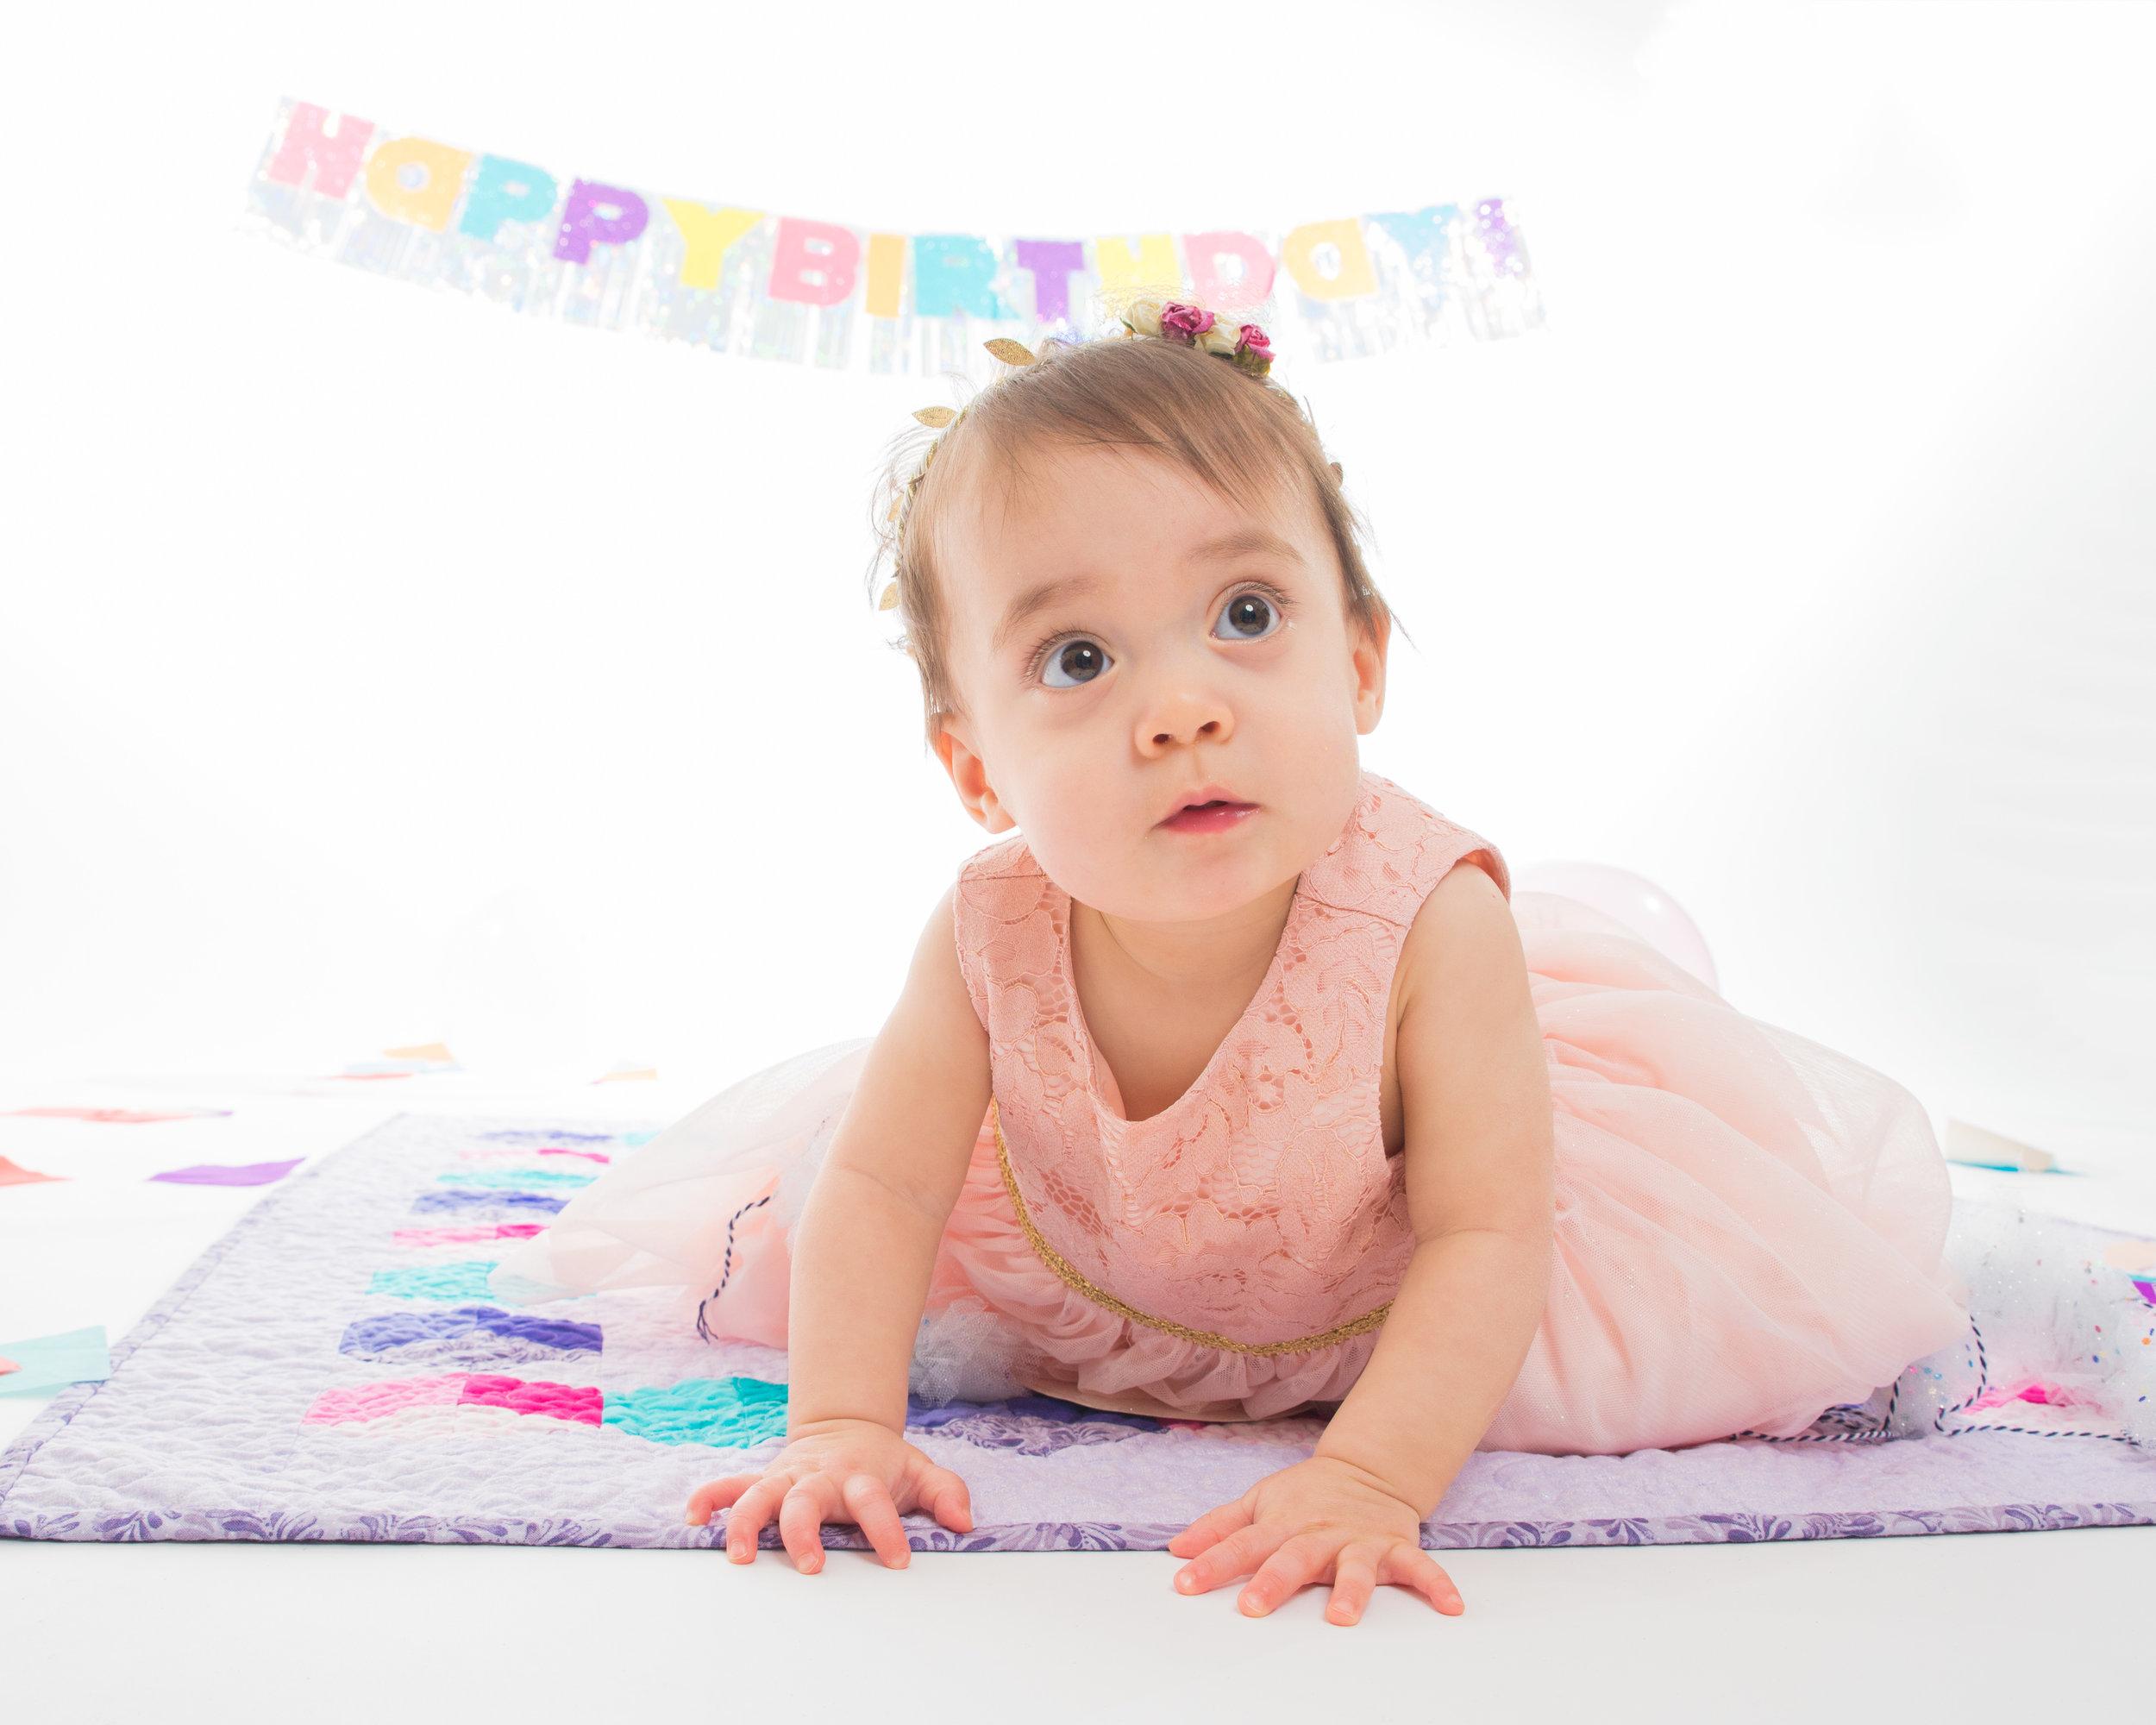 2018_February_04-Veronica_Sullivan_One_Year_Baby_Pics-44856-Edit.jpg